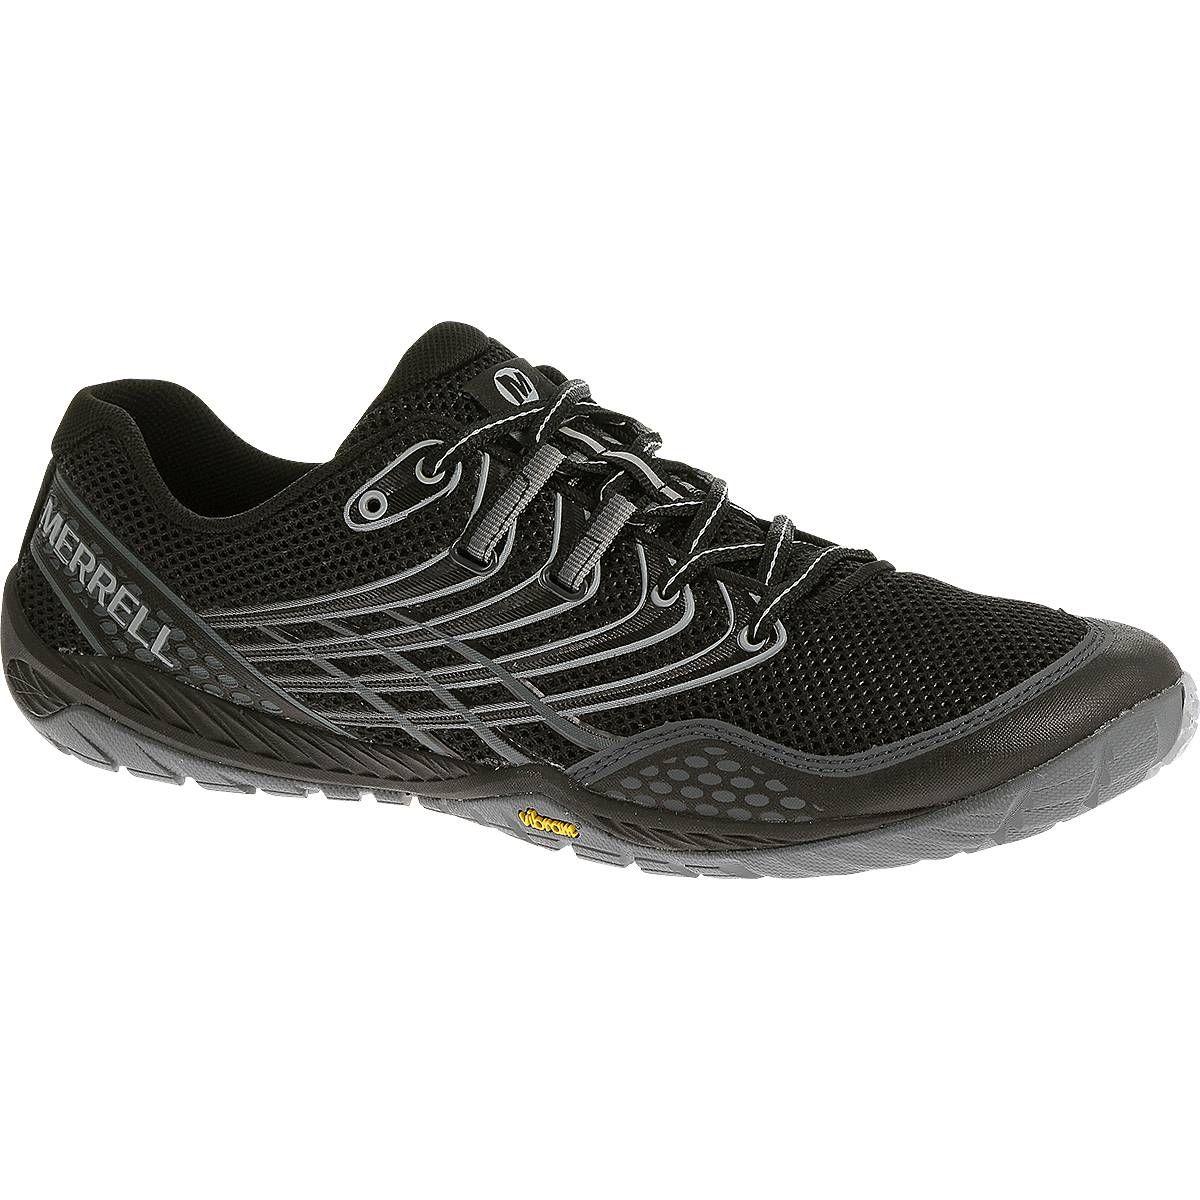 Merrell Lightweight Running Shoes Slip On